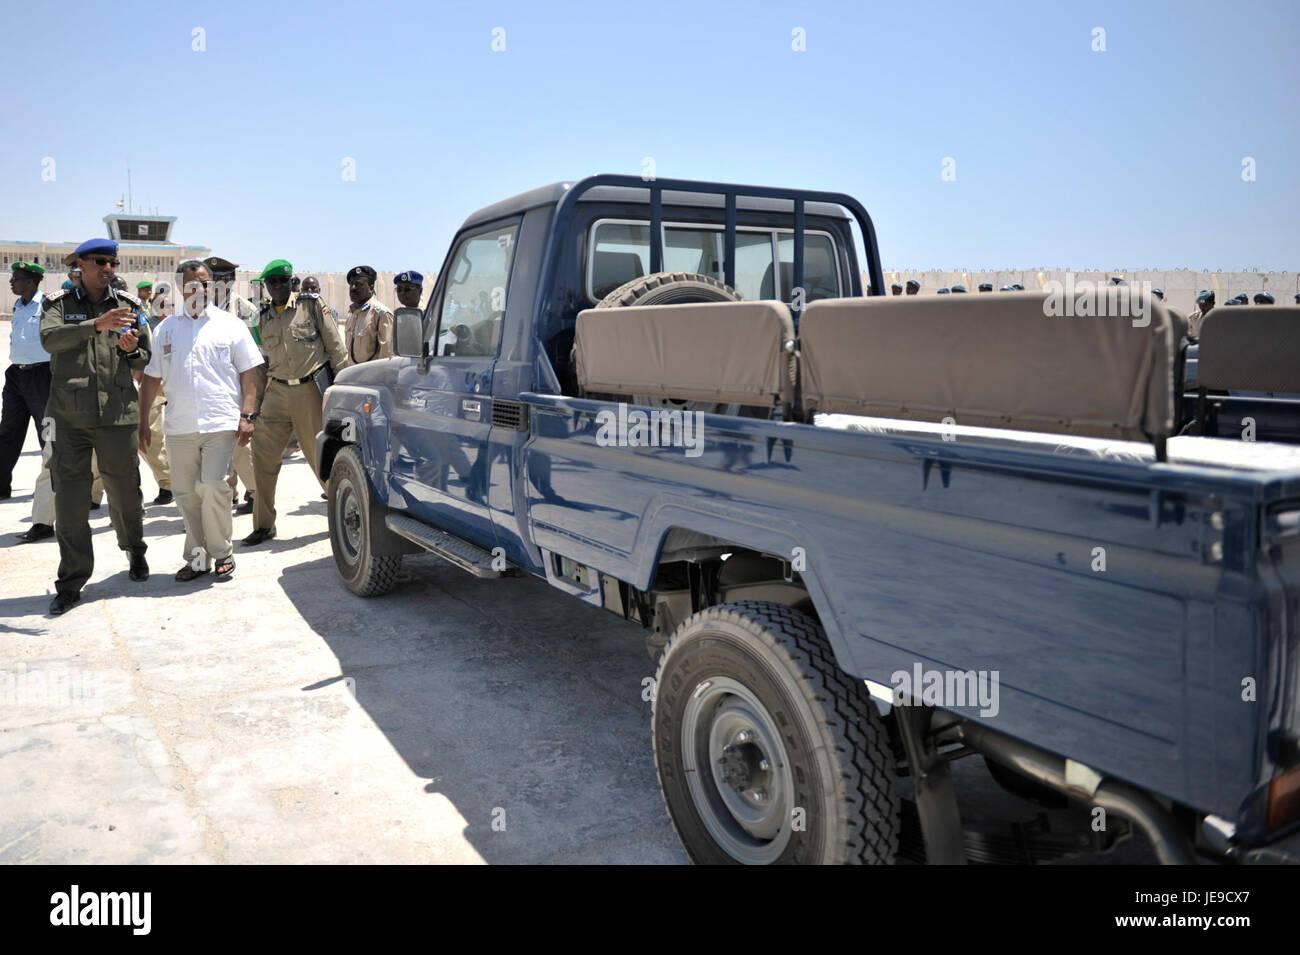 2014 03 01 Vehicles Handover-22 (12853966404) - Stock Image